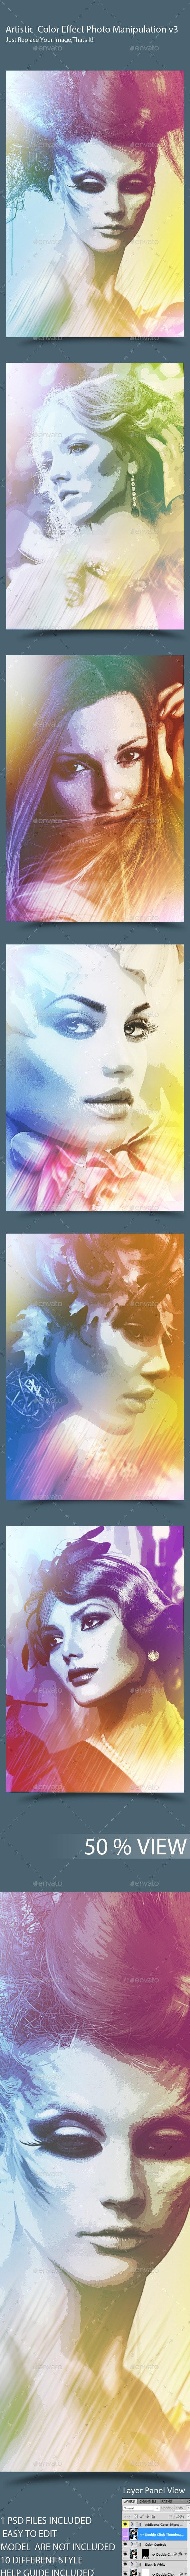 Color Effect Photo Manipulation v3 - Artistic Photo Templates